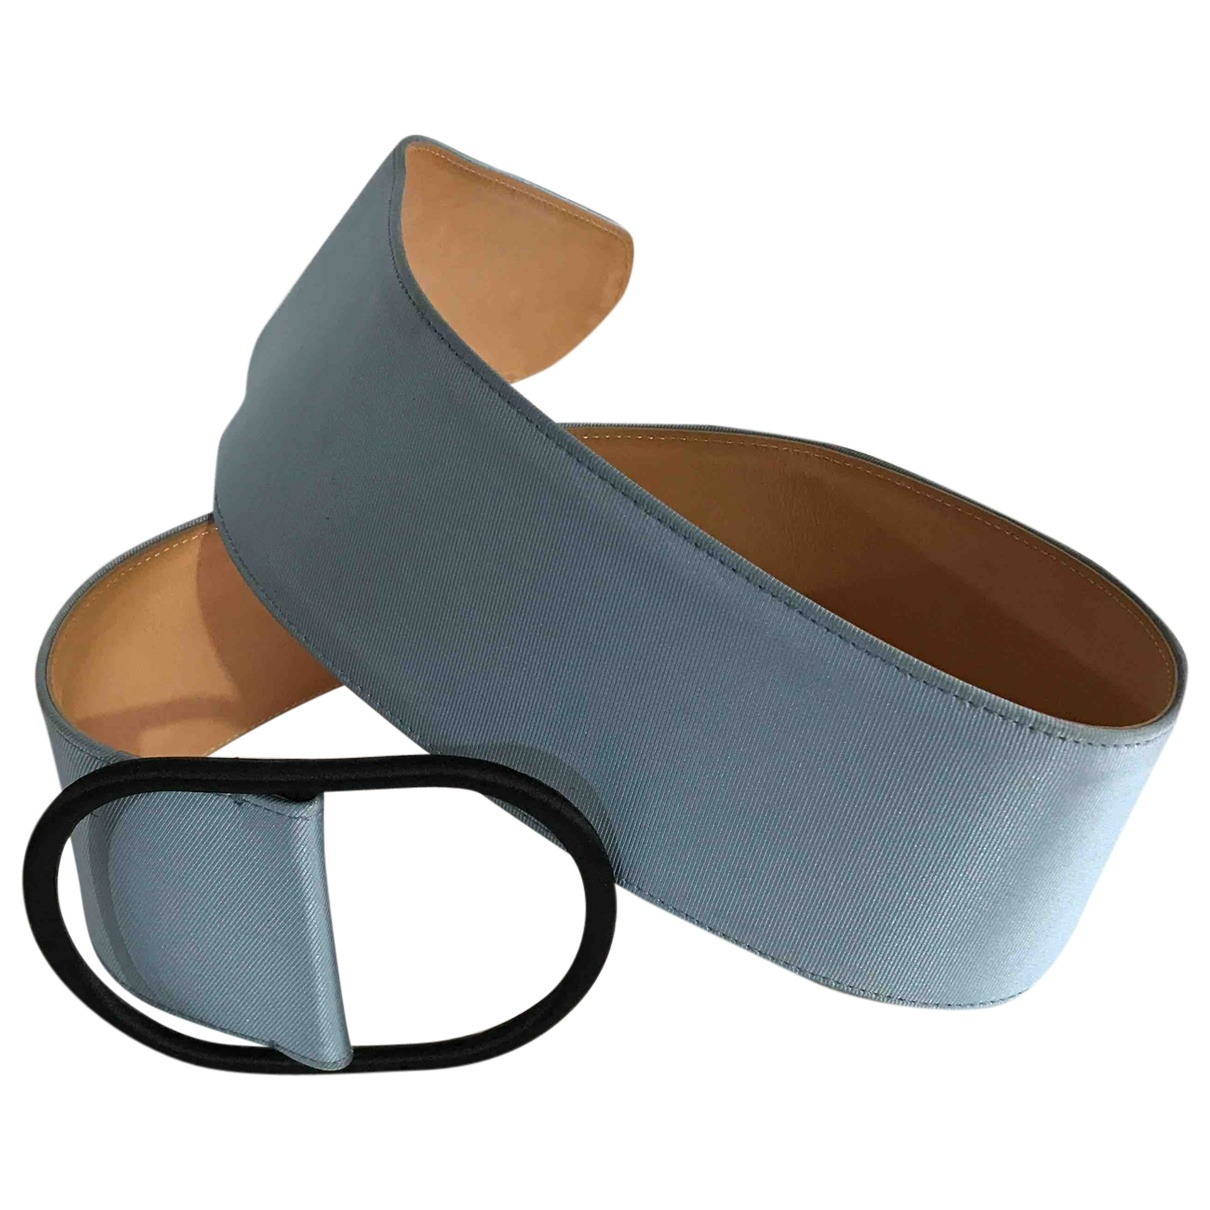 Giorgio Armani \N Leather belt for Women M International